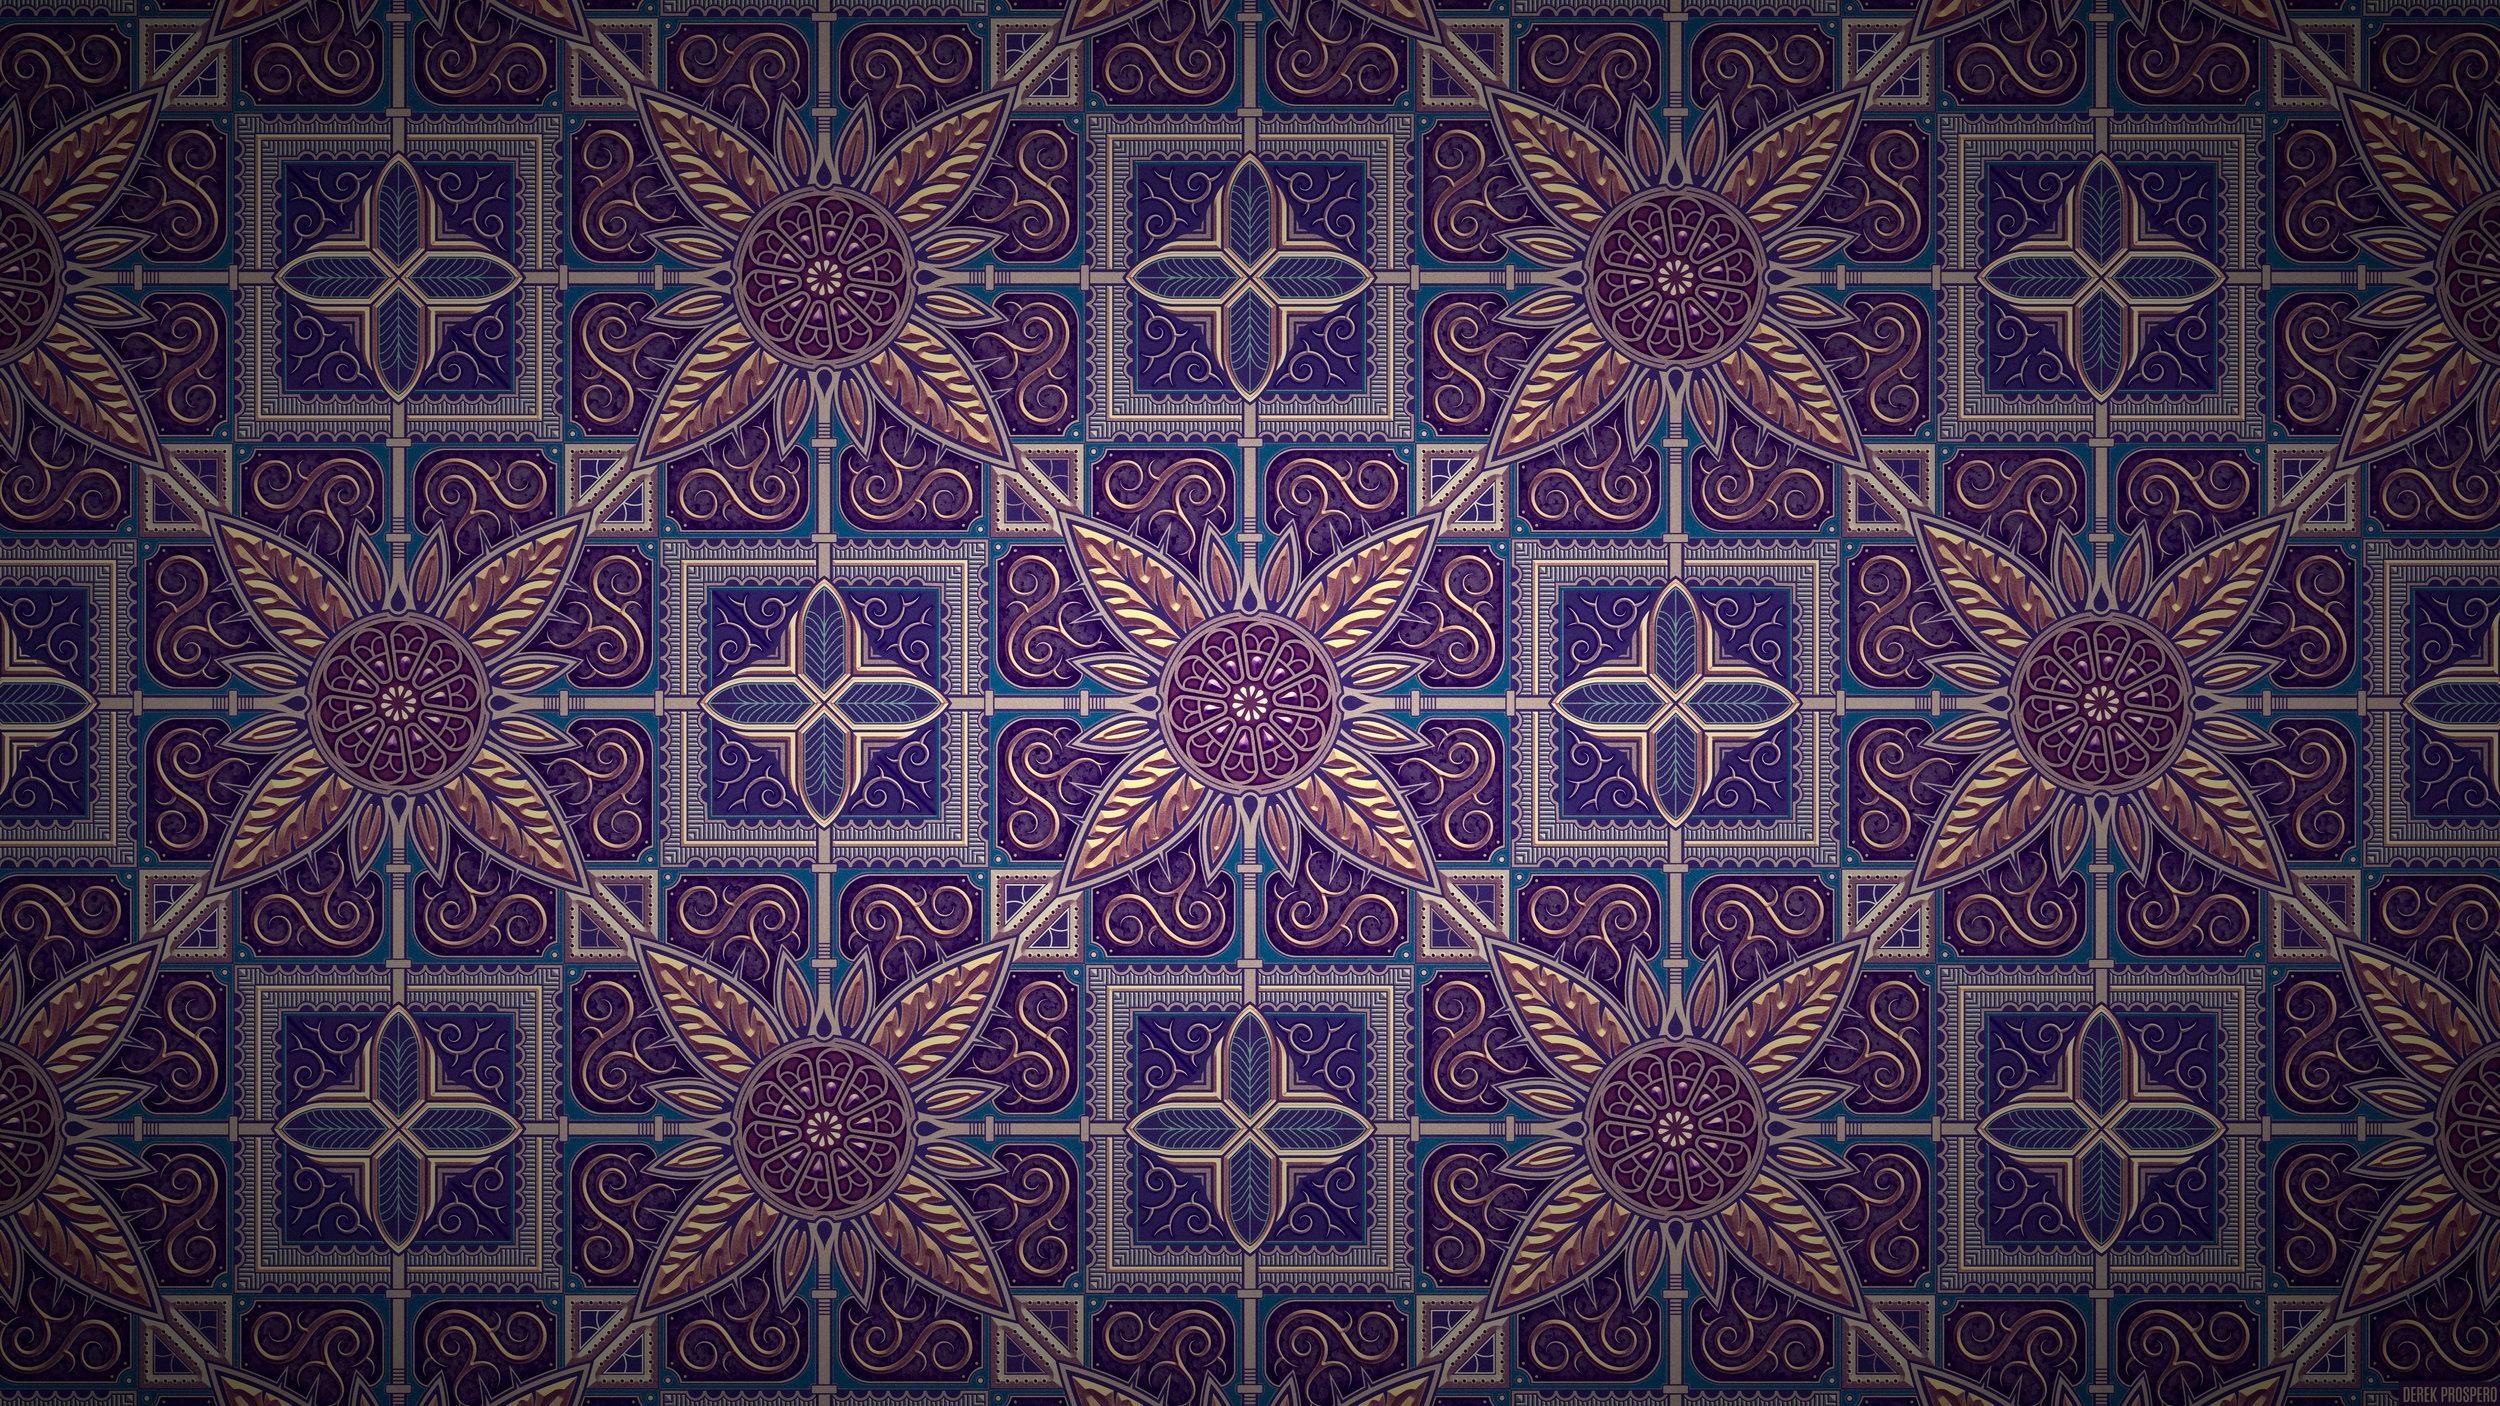 pattern-008.jpg